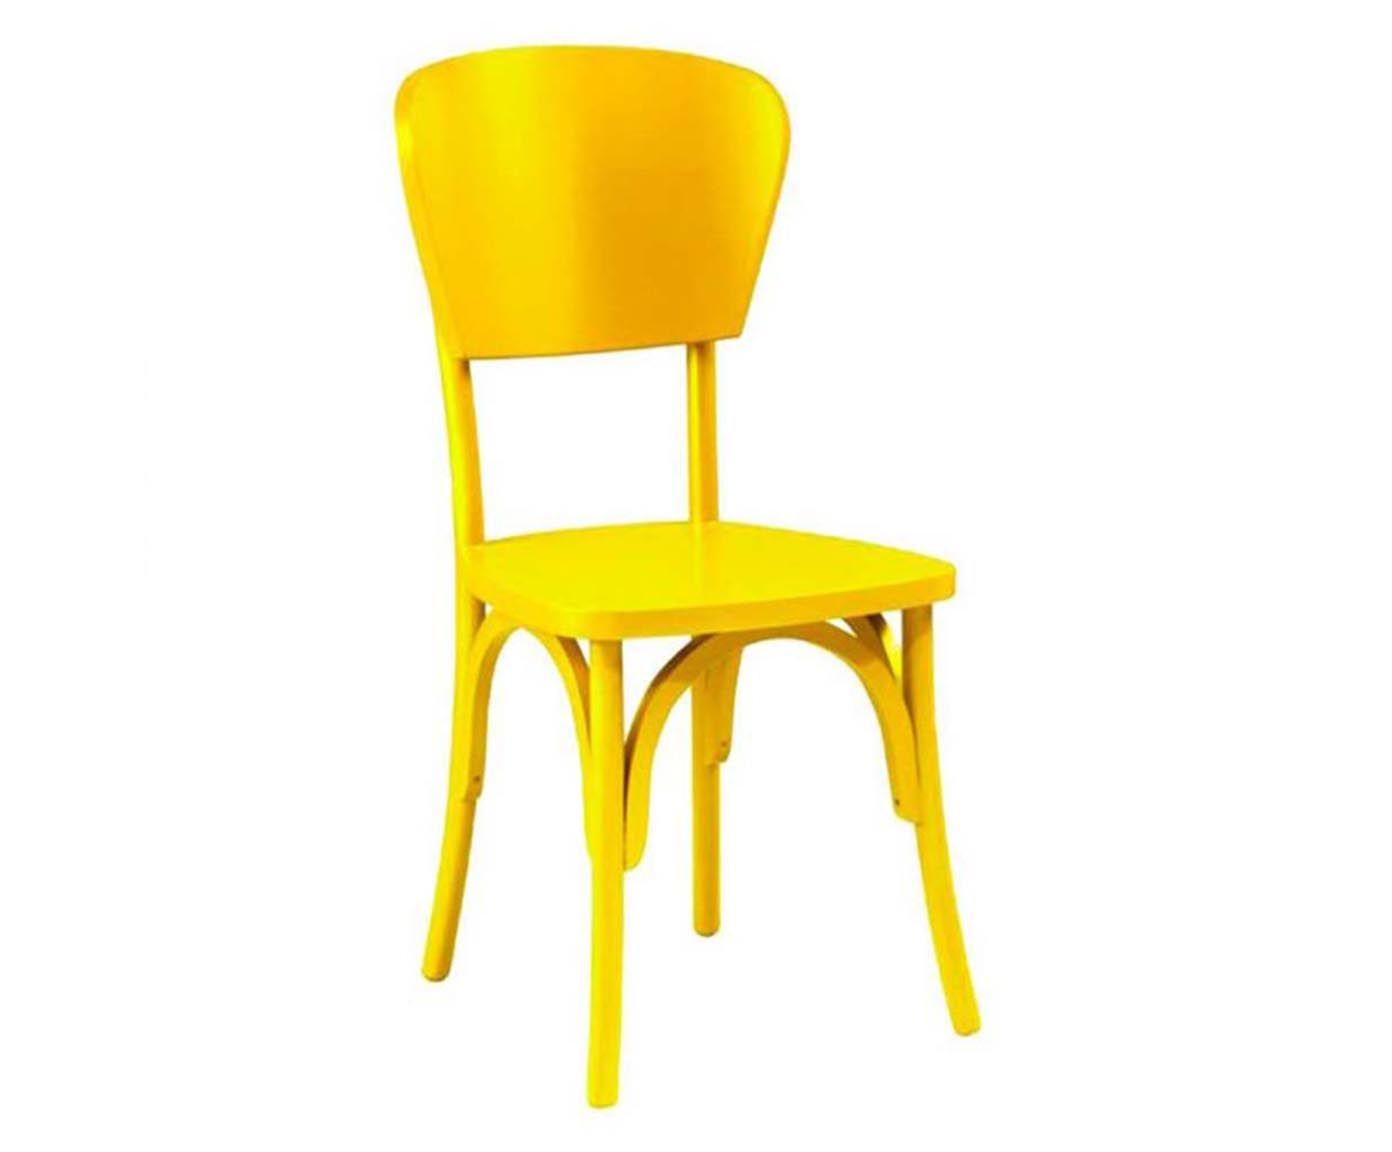 Cadeira romarin plank - soleil | Westwing.com.br